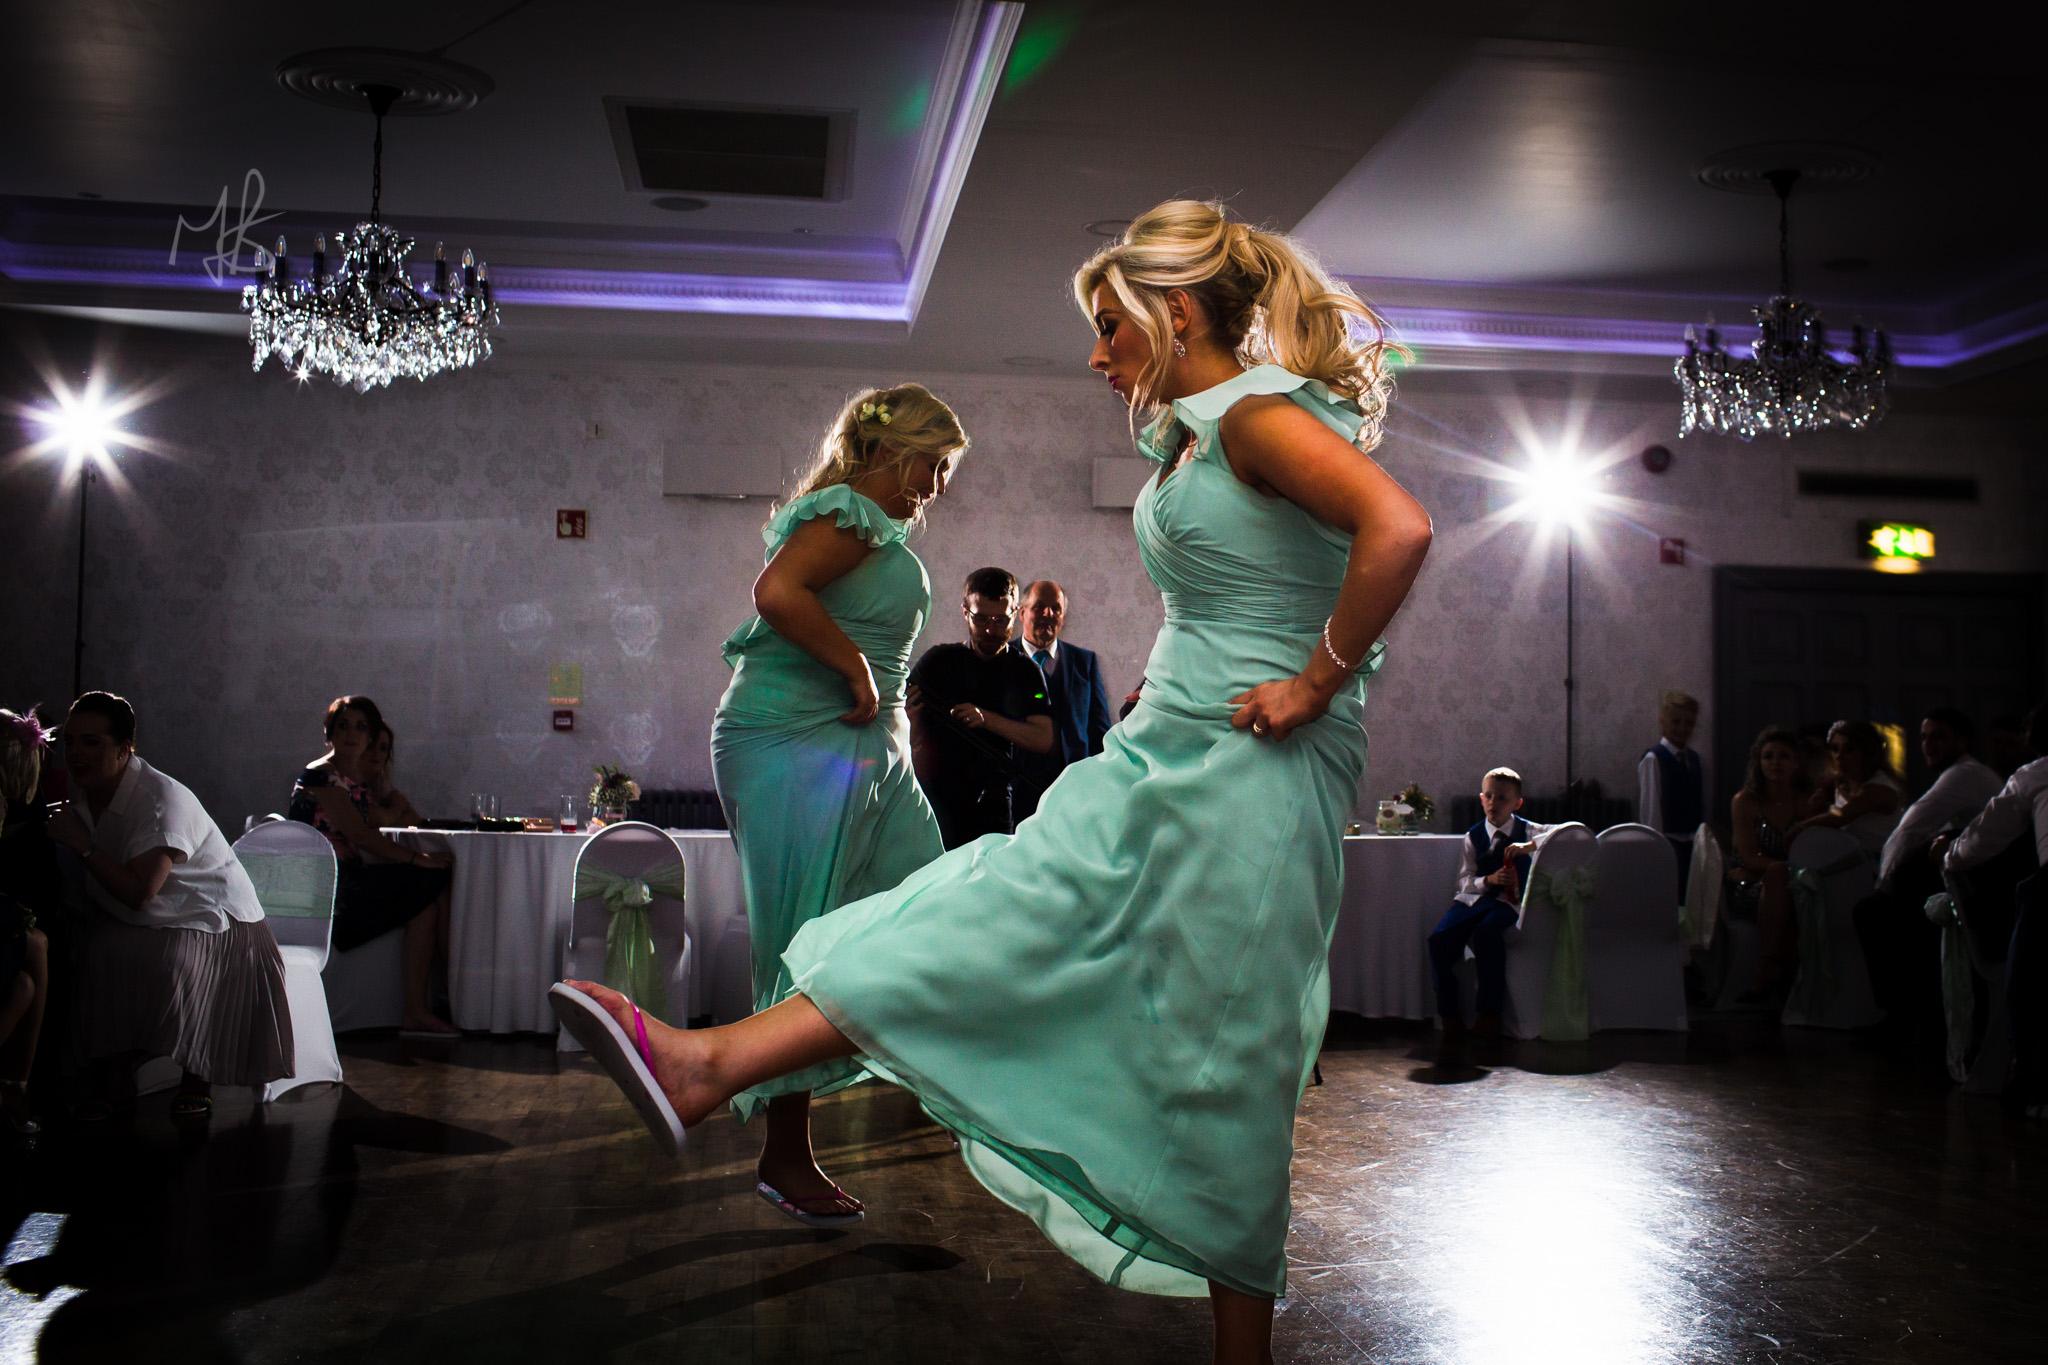 Northern-Ireland-Wedding-Photographer-Mark-Barnes-Ballymena_wedding-photography-Leighinmohr-House-Seamas_Alanna_For-web-63.jpg